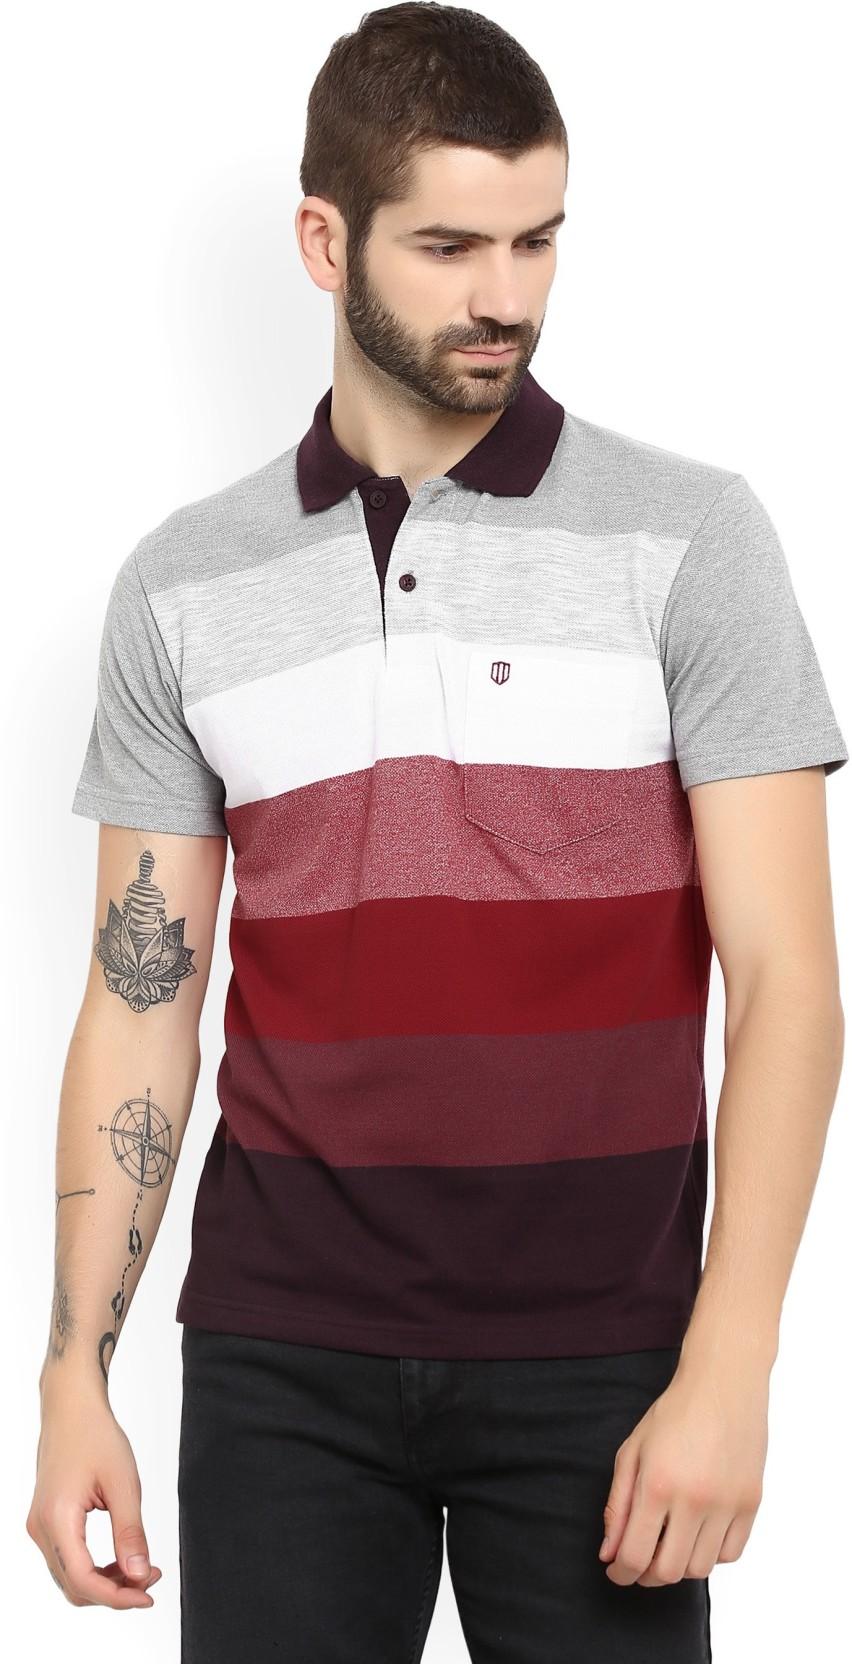 D555 Duke Mens Chigbo Big Tall Long Sleeve Polo Shirt